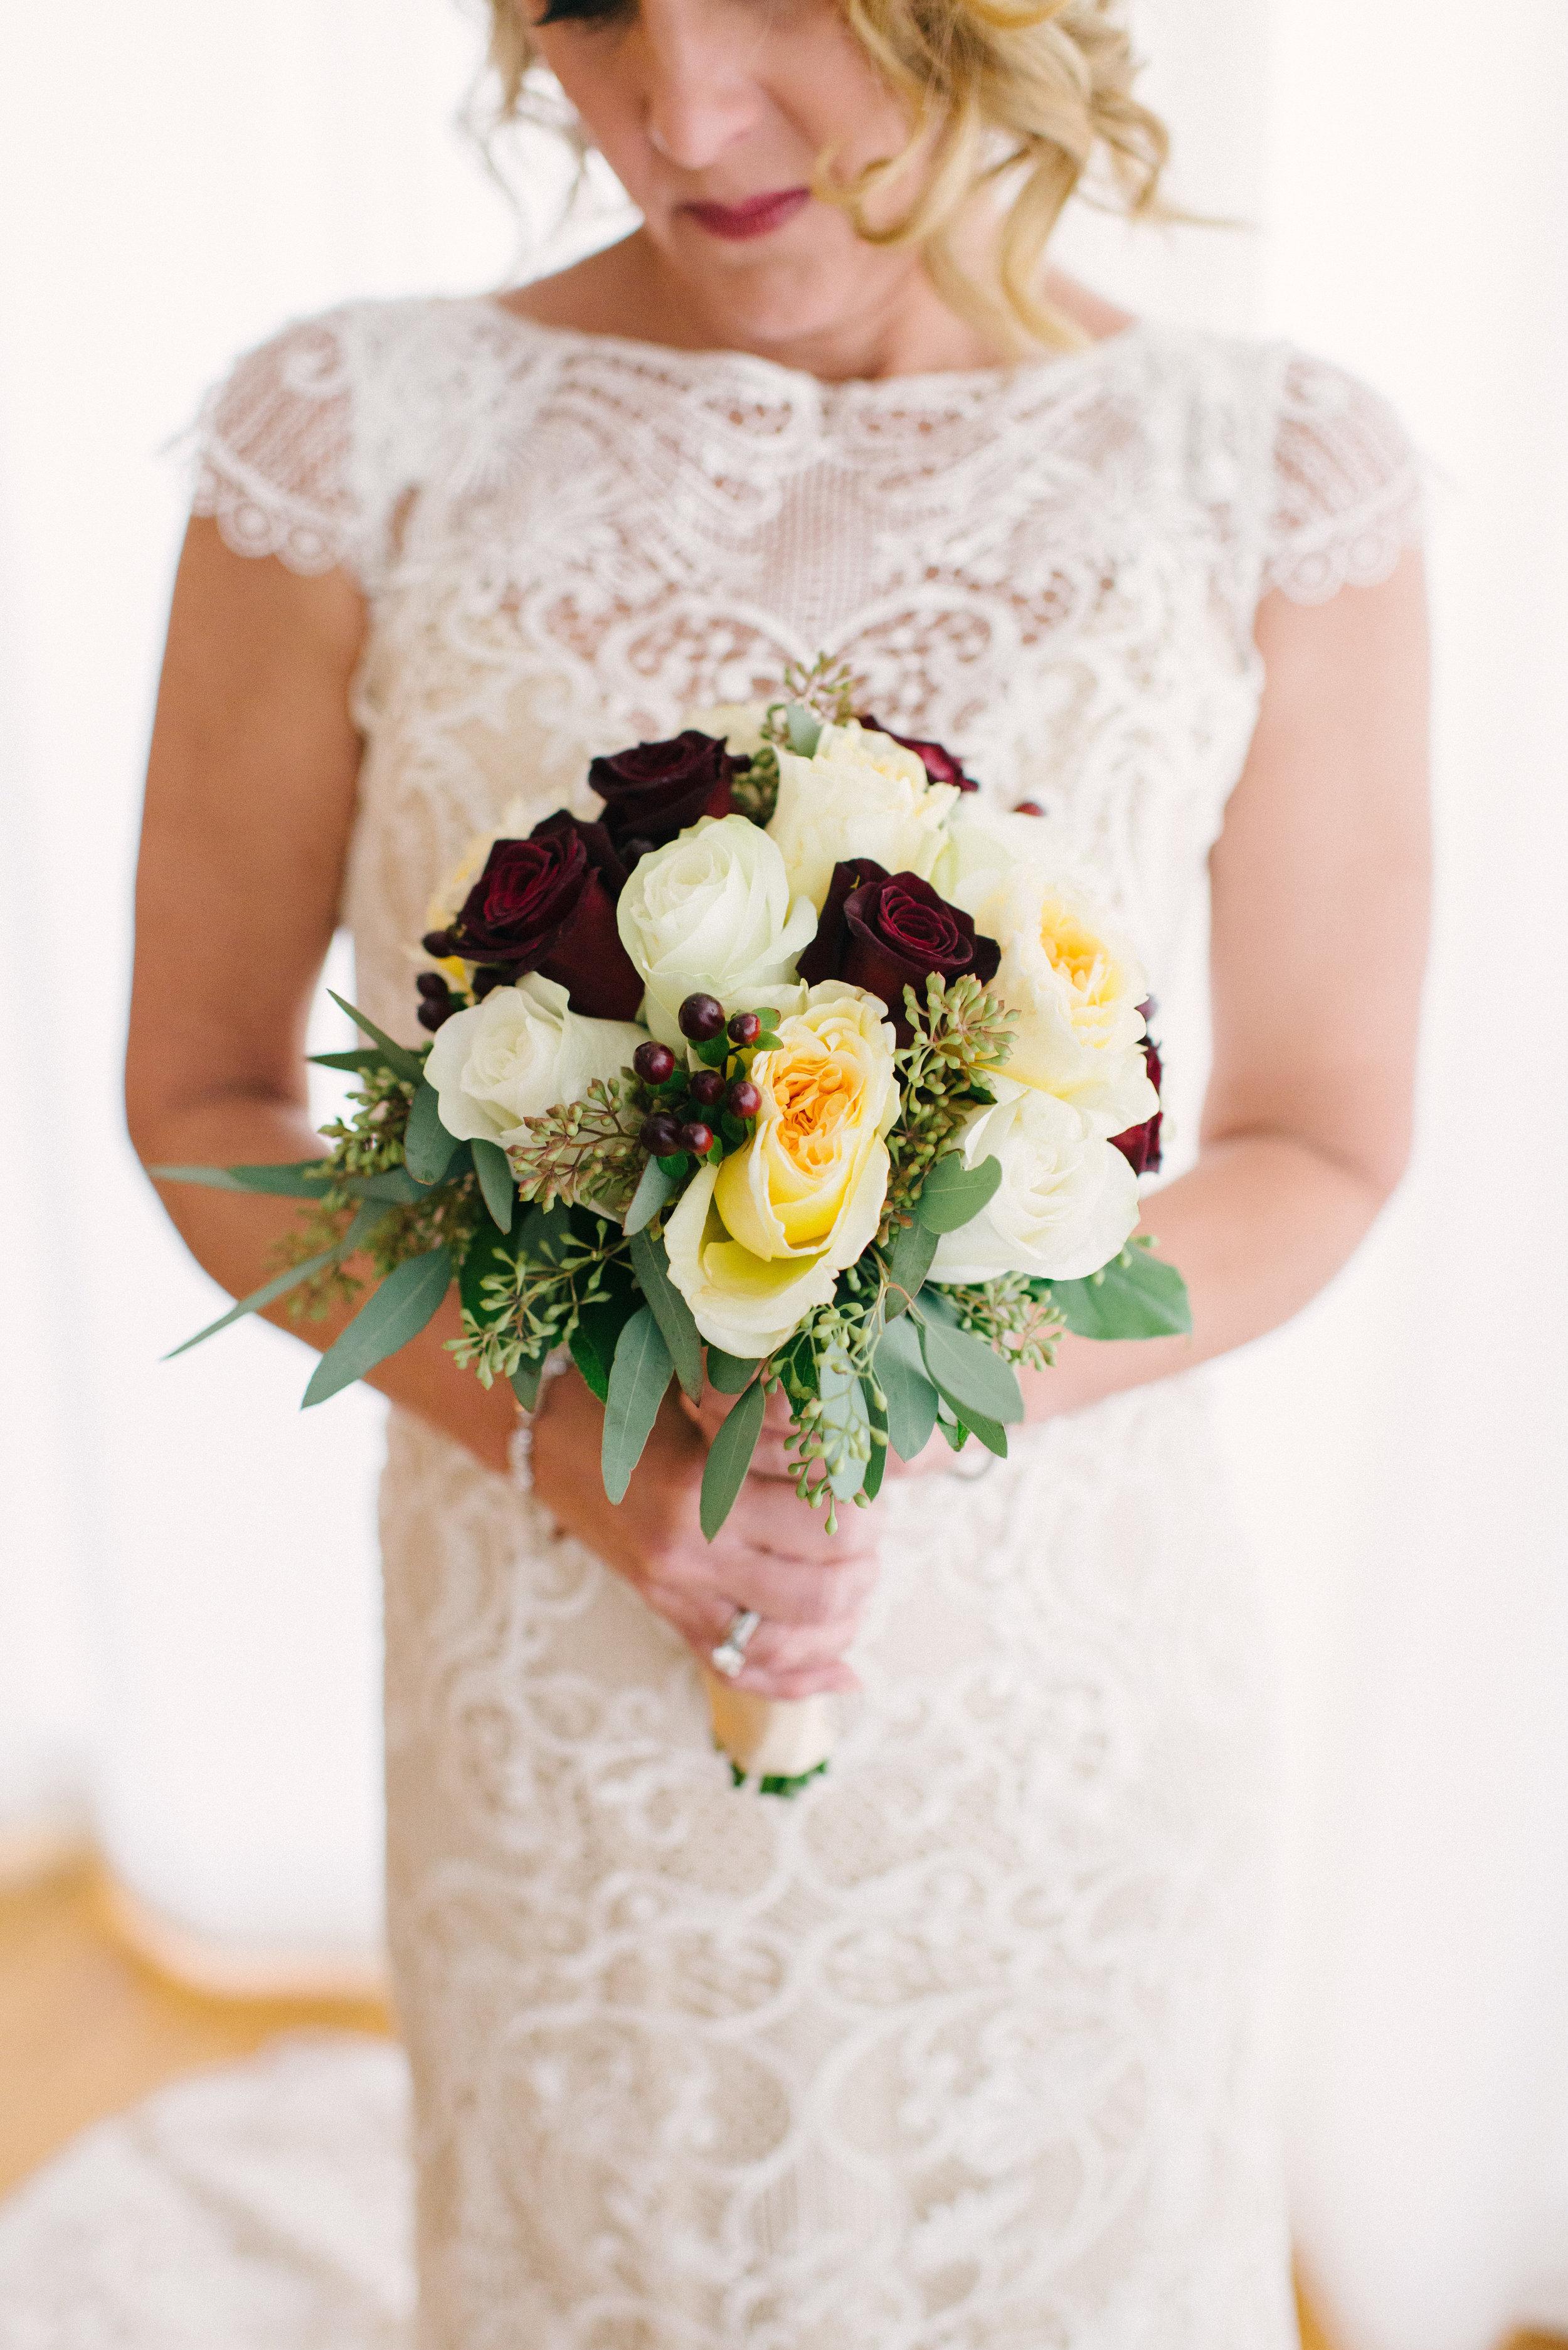 KateTaramykinStudios-Portfolio-Weddings-WinterPark-13.jpg